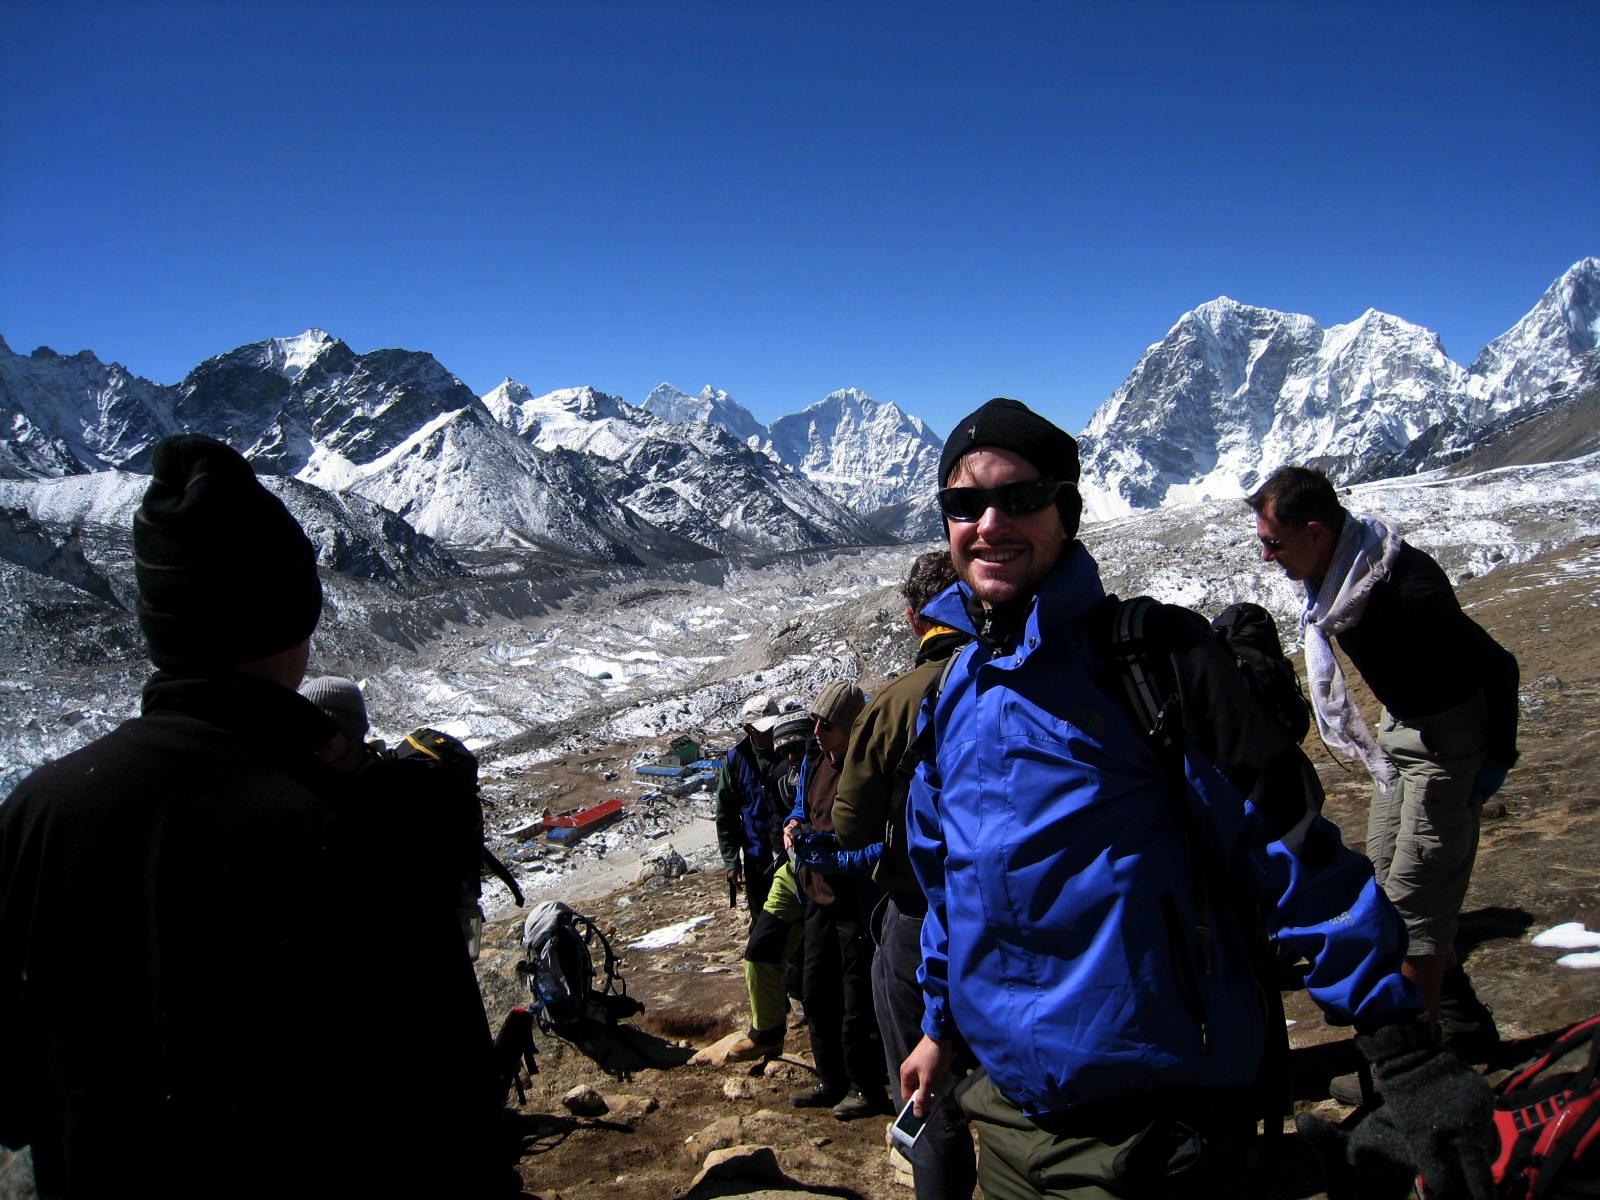 Khumbu valley, approaching Everest base camp